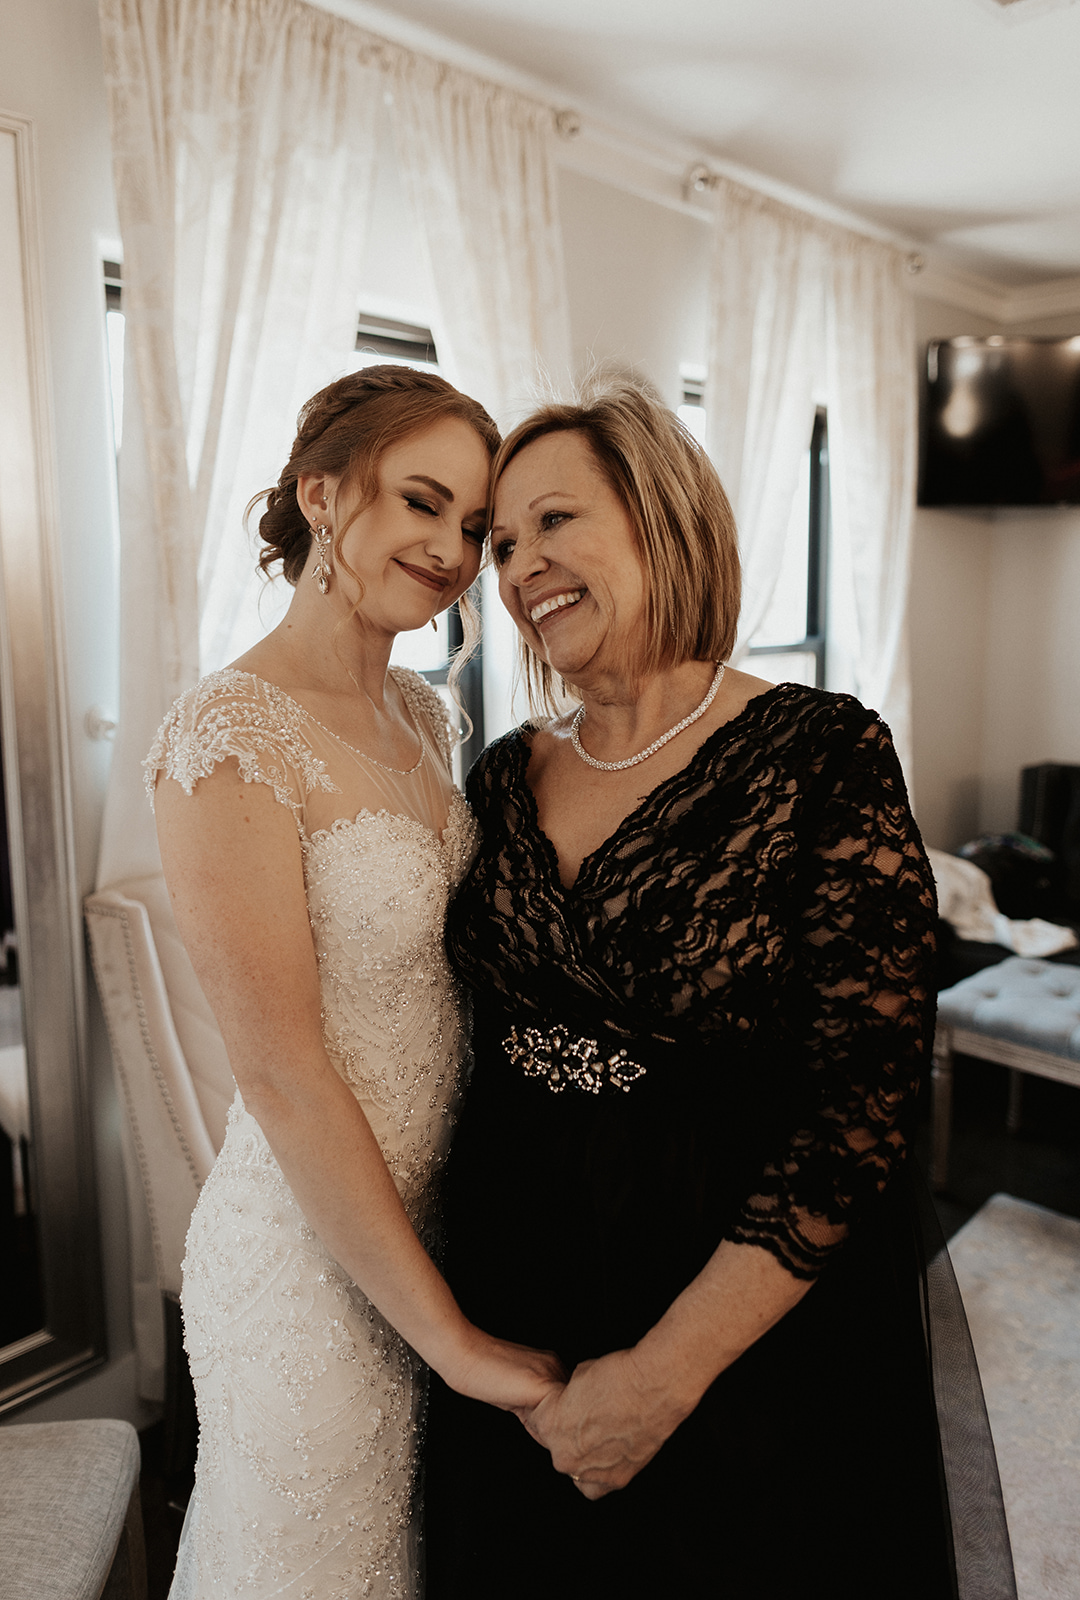 Best Wedding Venue in Tulsa Bixby Dream Point Ranch 10.jpg